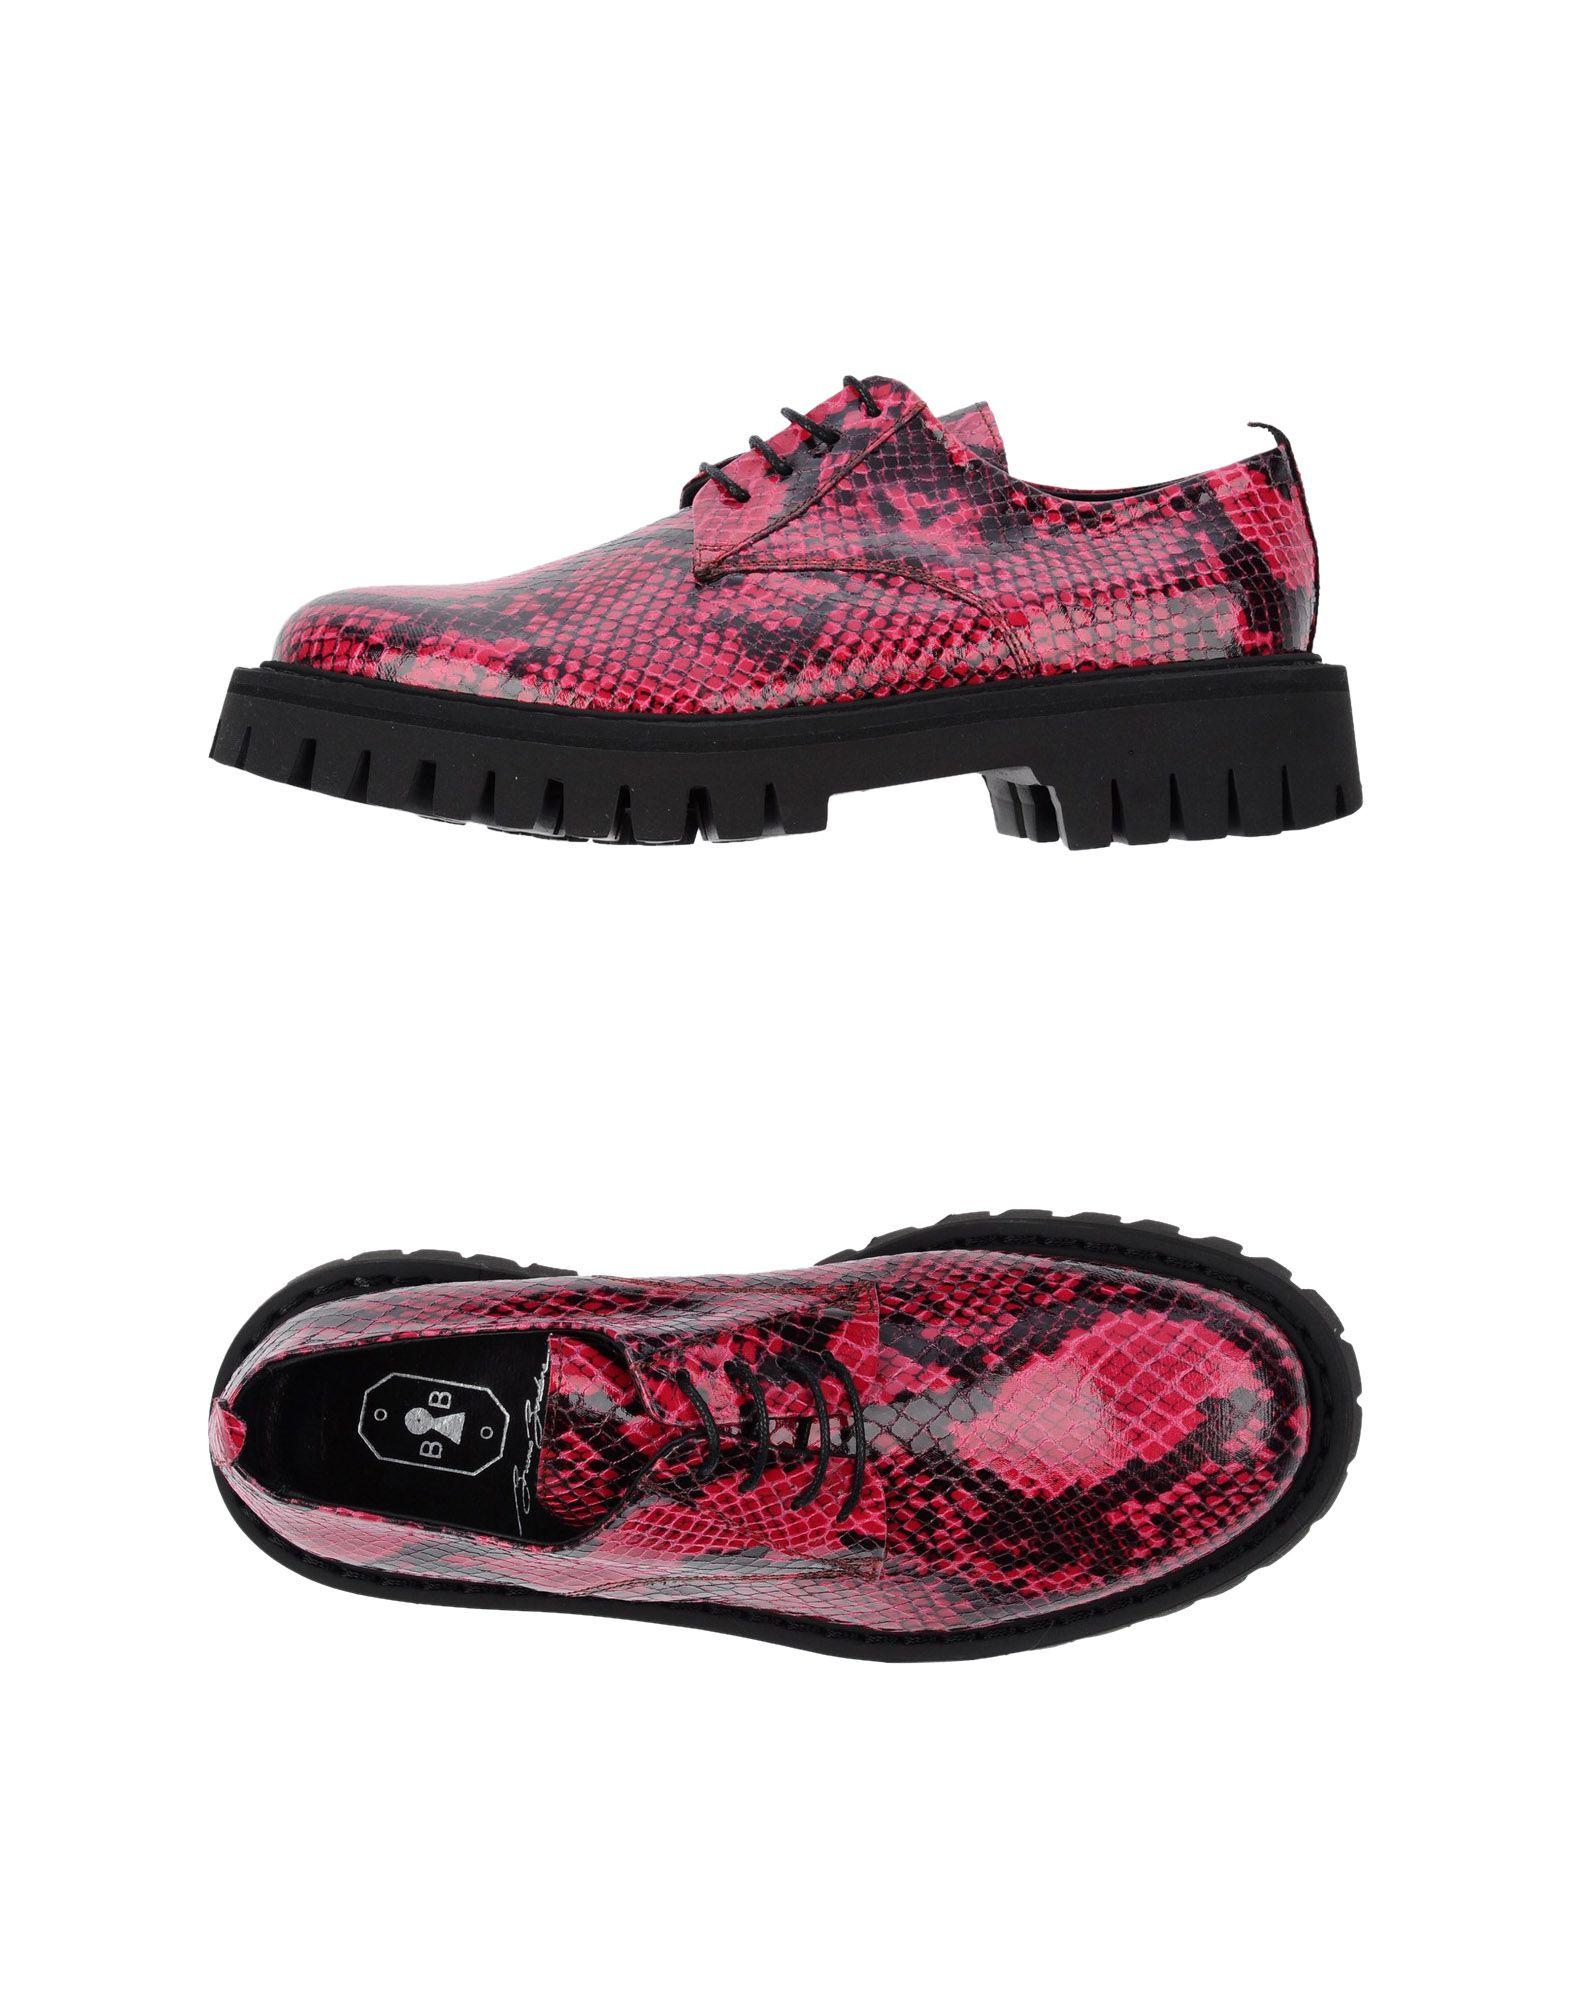 ФОТО bruno bordese обувь на шнурках